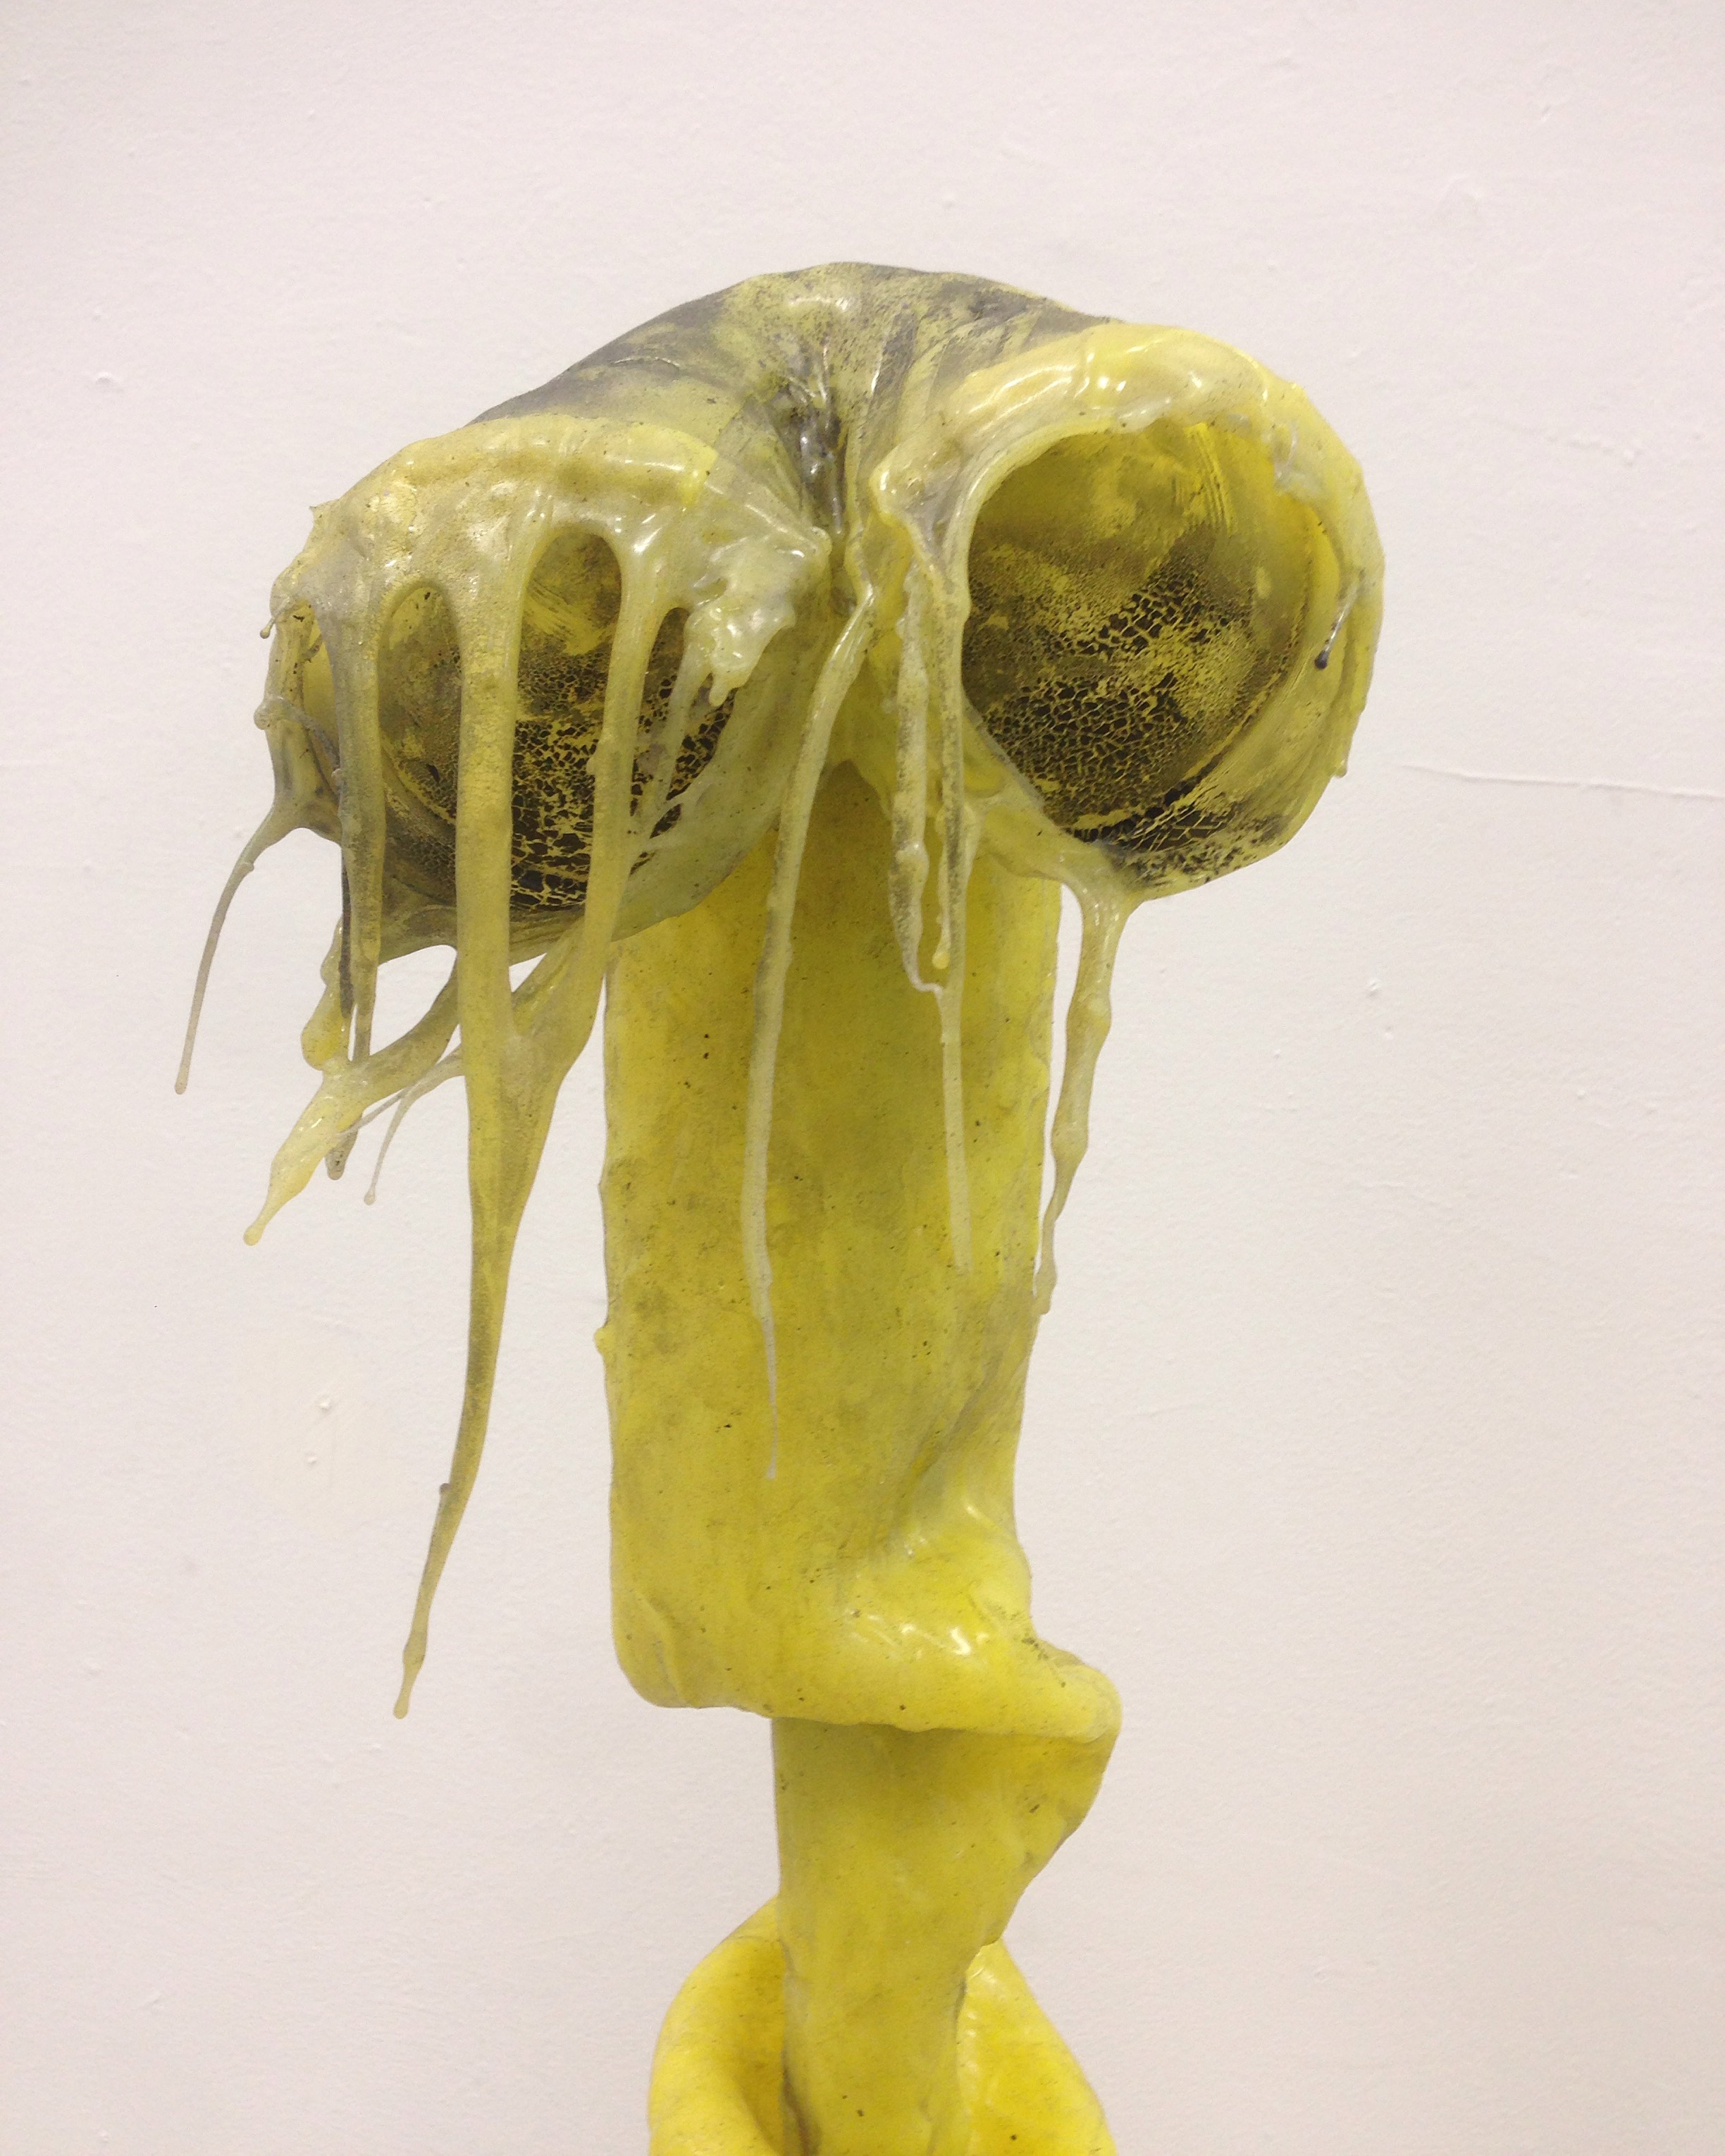 yellow rubber tube #1